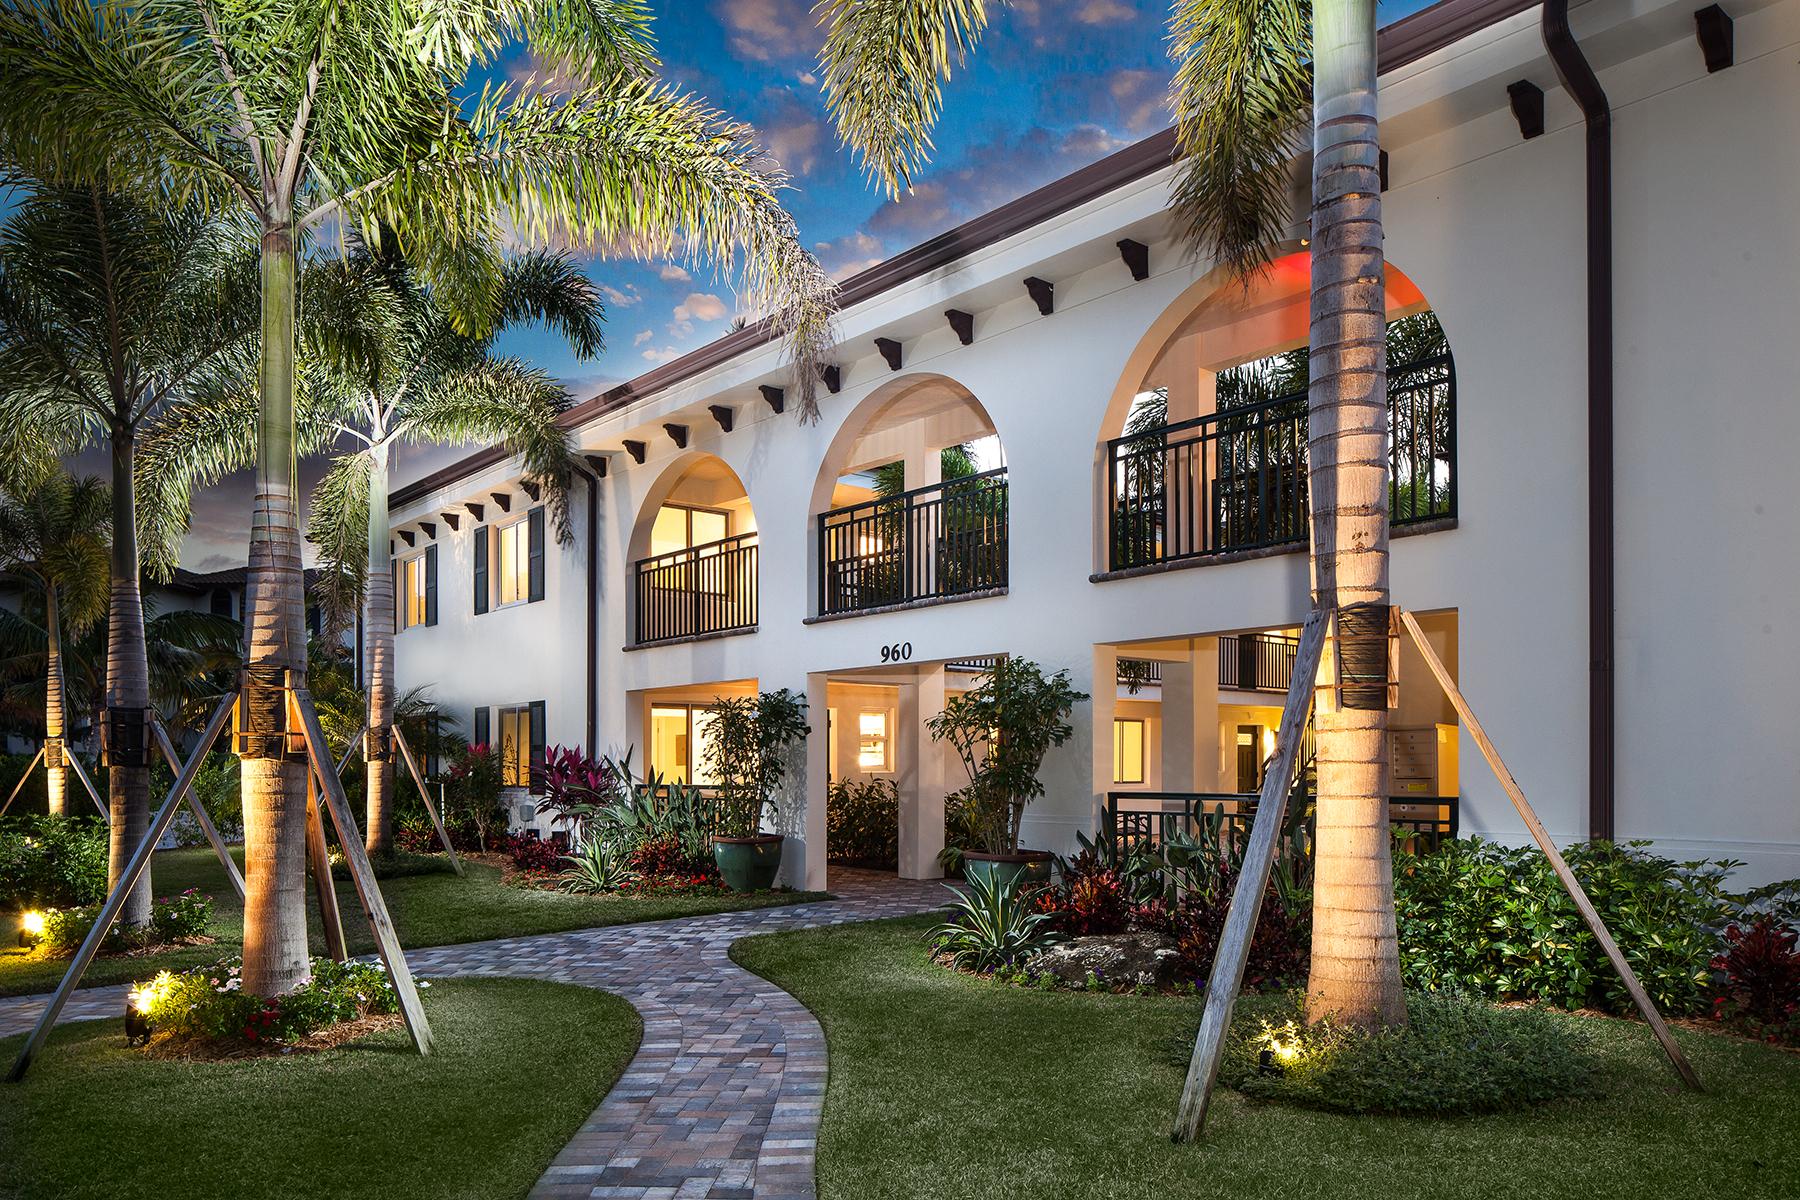 sales property at 960 7th St S, 104, Naples, FL 34102